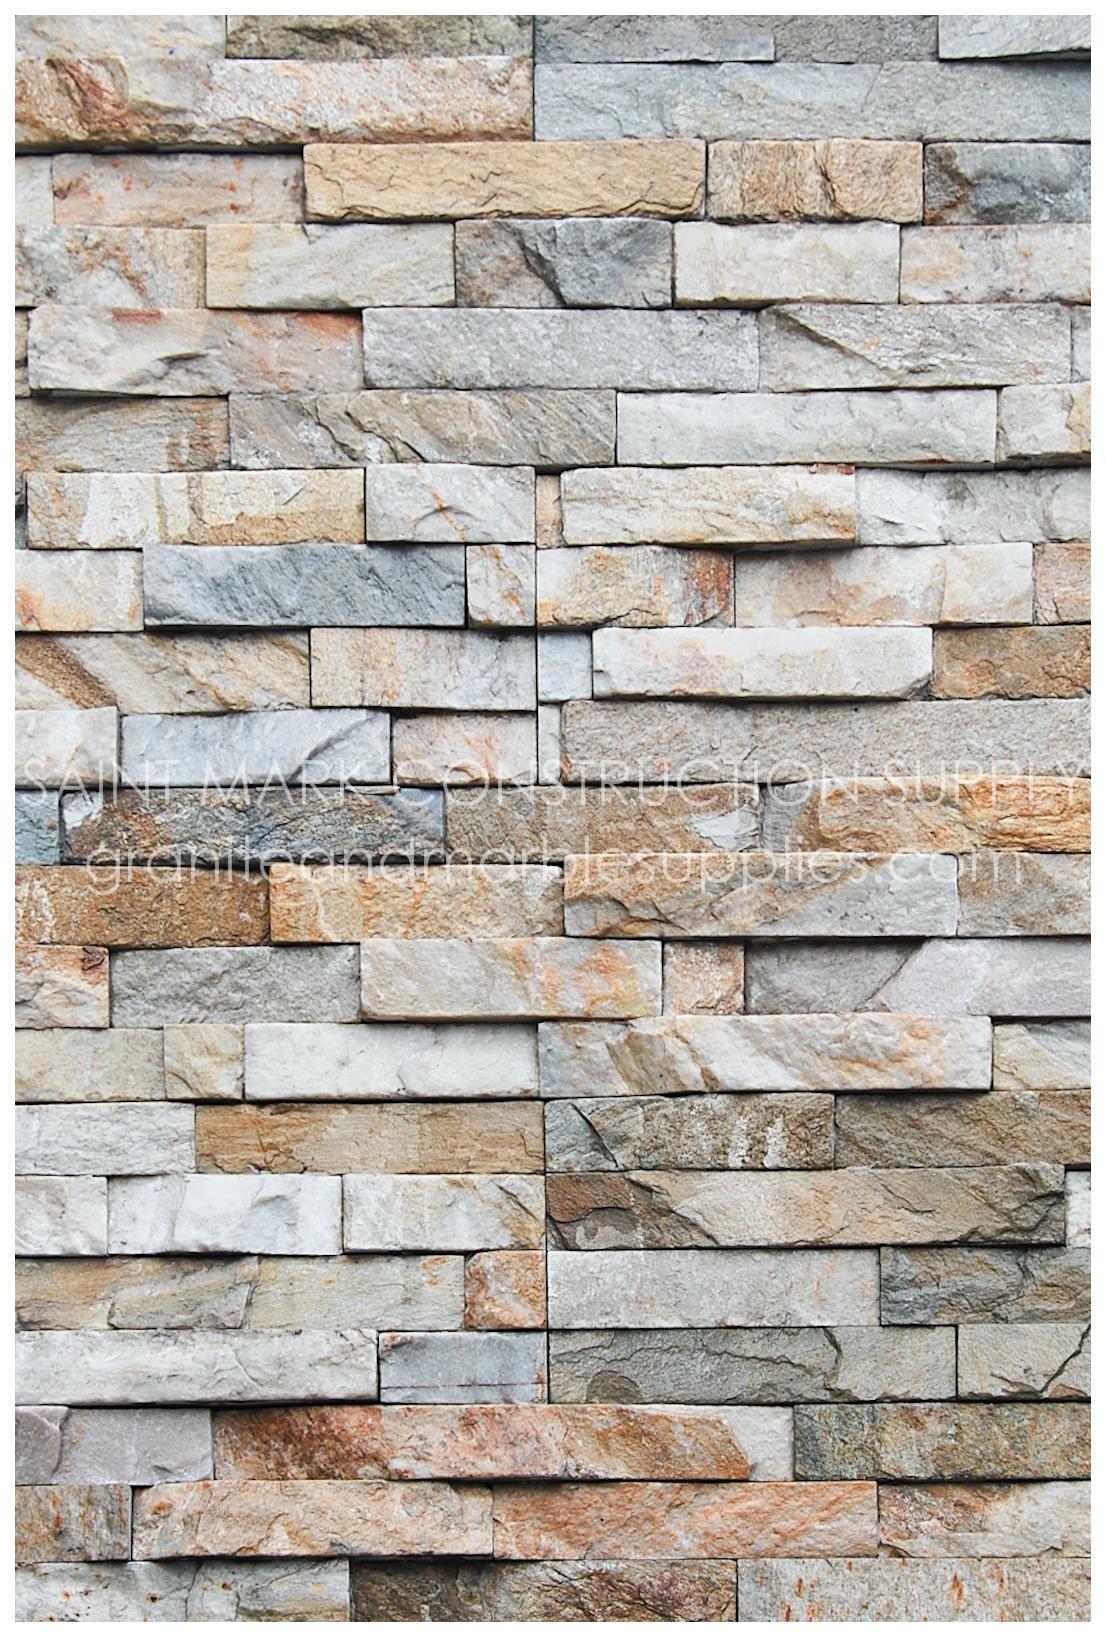 Decorative Wall Stone : Decorative natural stones saint mark construction supply